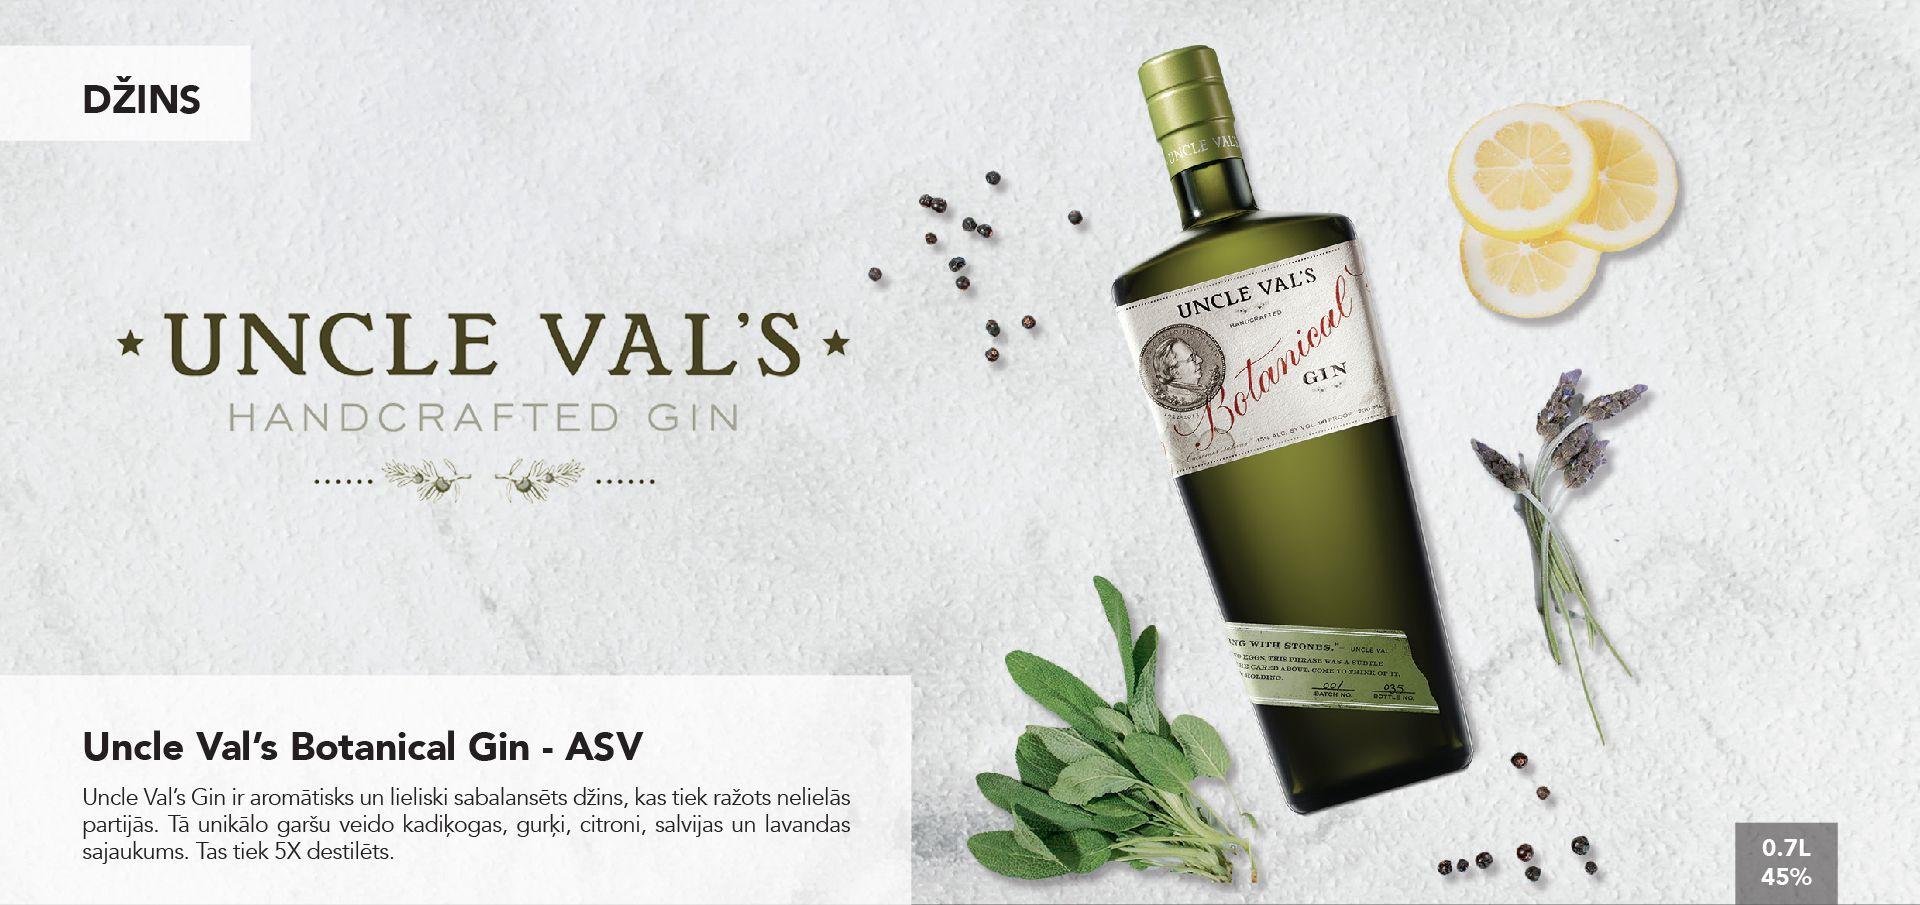 Uncle Val's Botanical Gin - ASV